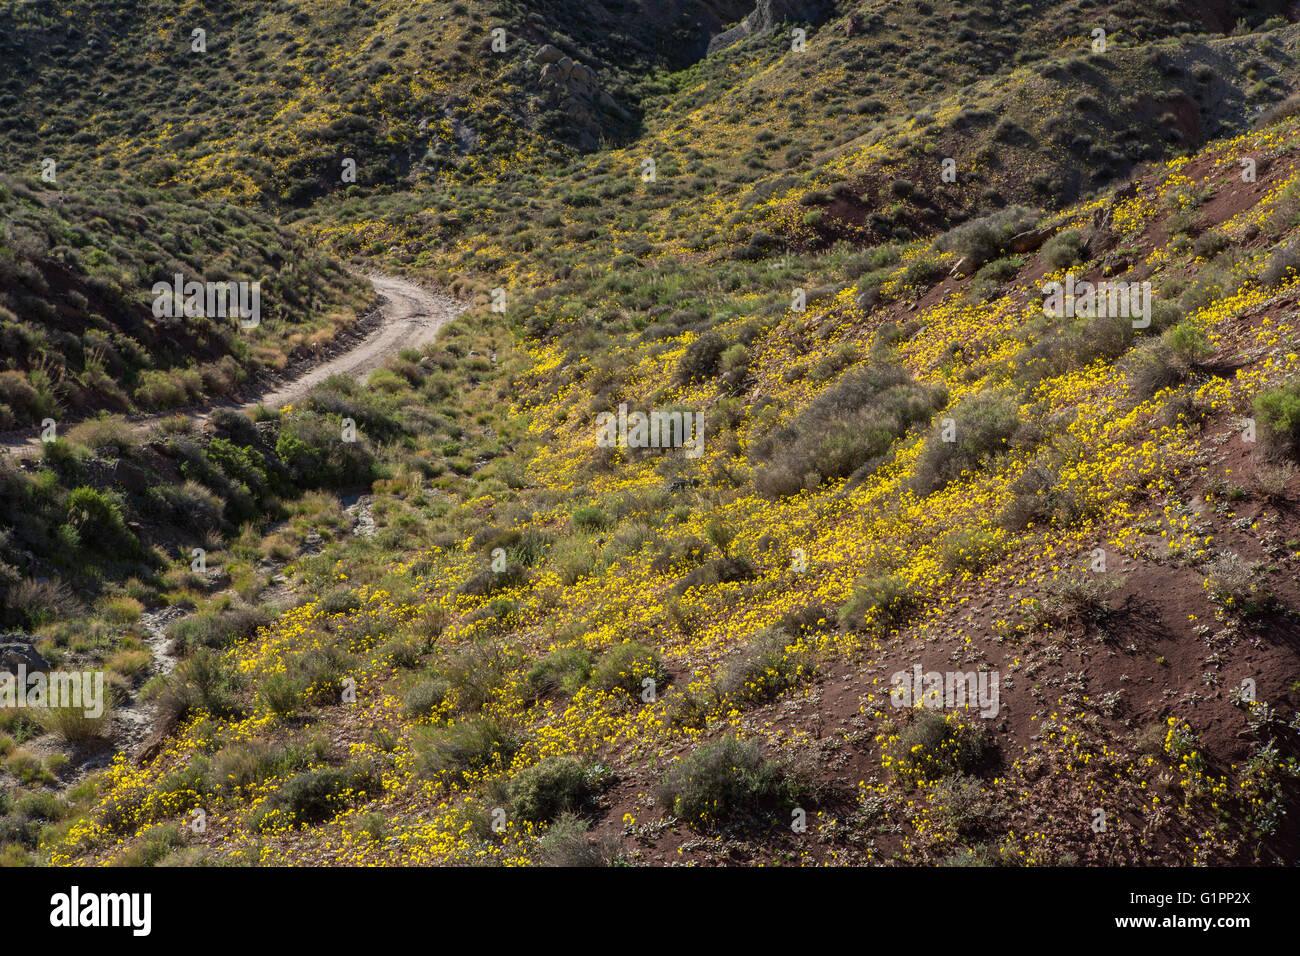 Wildflowers blooming in Death Valley - Stock Image